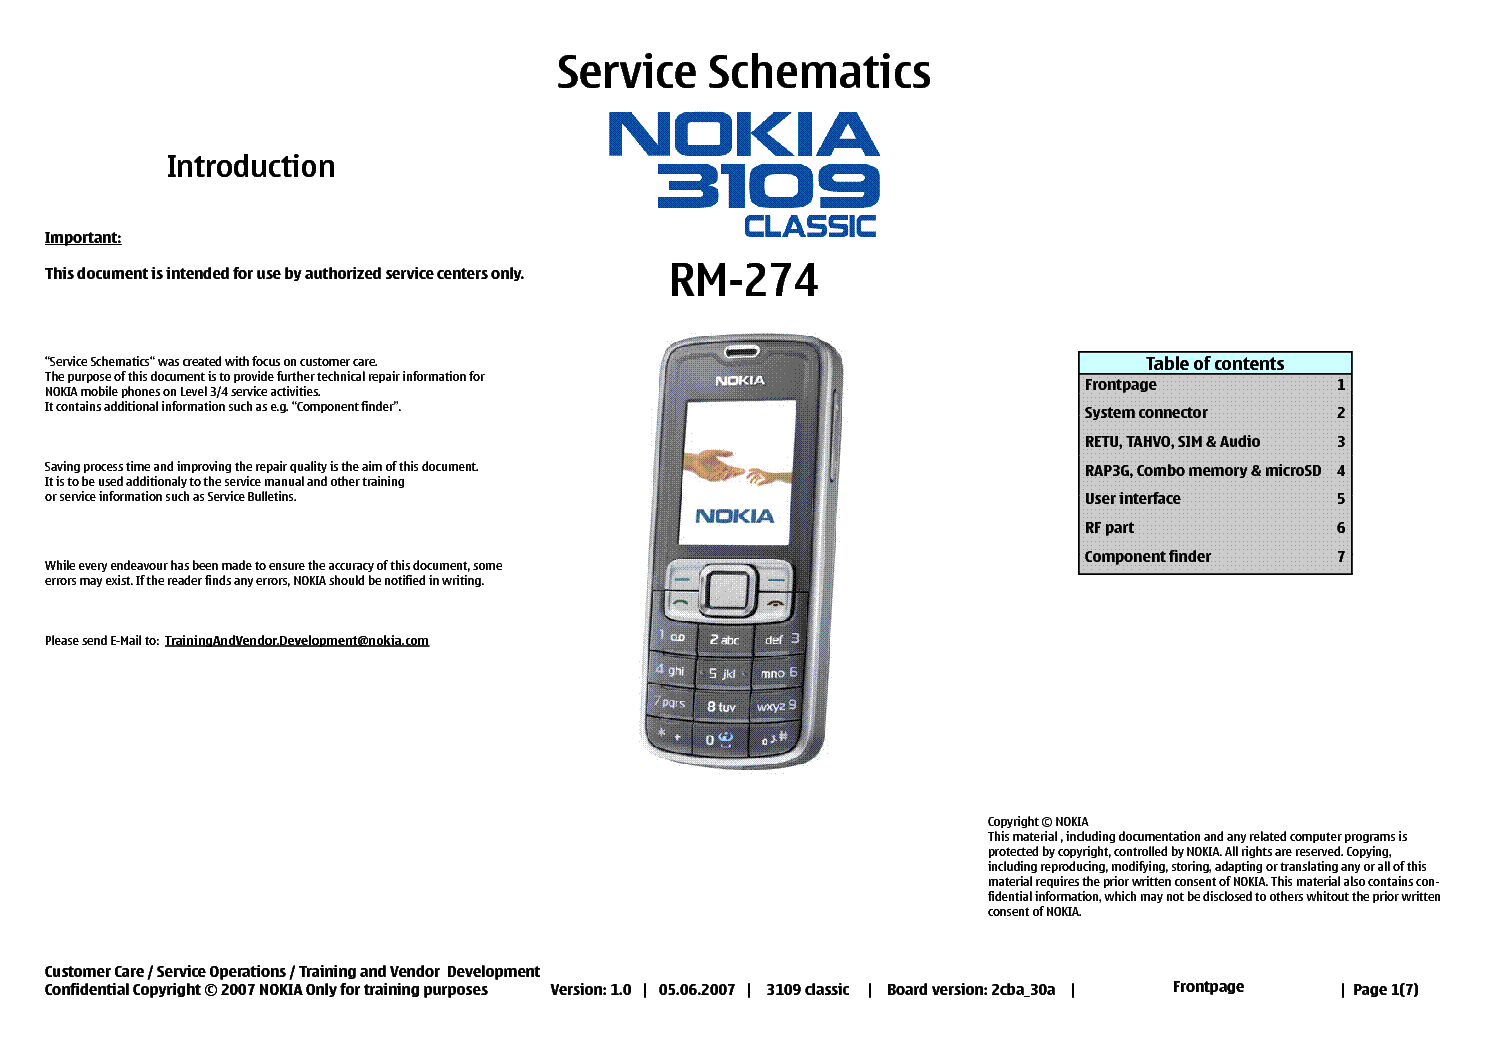 nokia 3109 rm 274 schematics service manual download schematics rh elektrotanya com Nokia 51 Old Nokia 3220